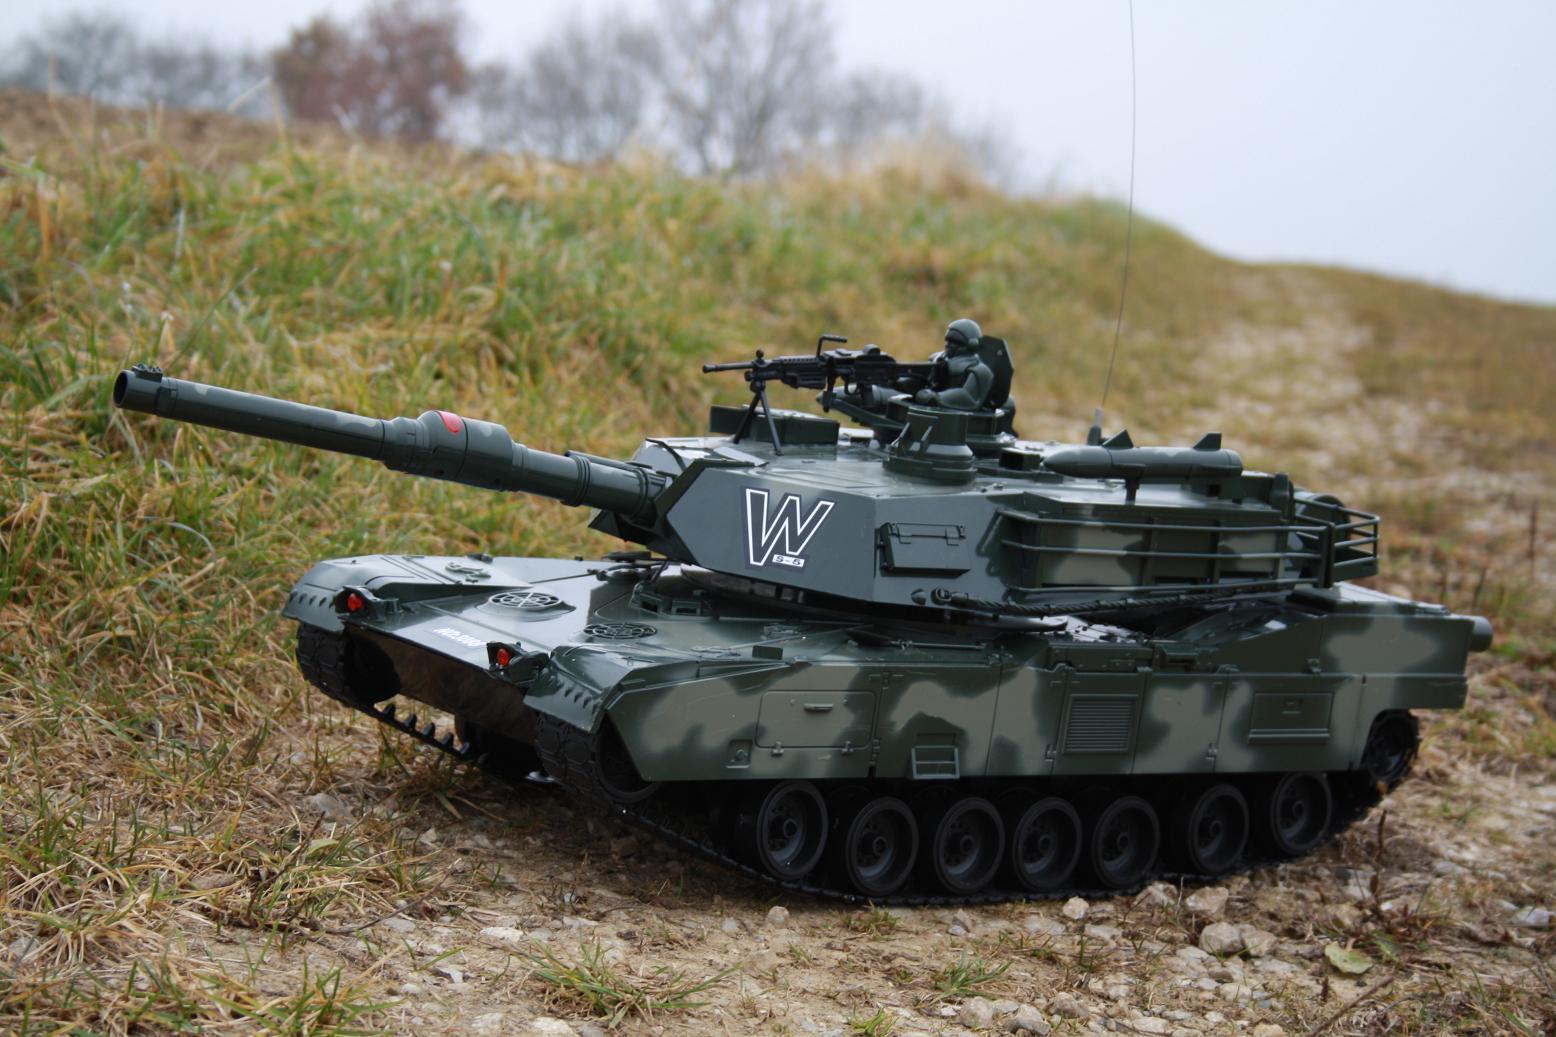 rc panzer leopard 2 fast 3 4 meter lang schussfunktion schiesst echte kugeln ebay. Black Bedroom Furniture Sets. Home Design Ideas